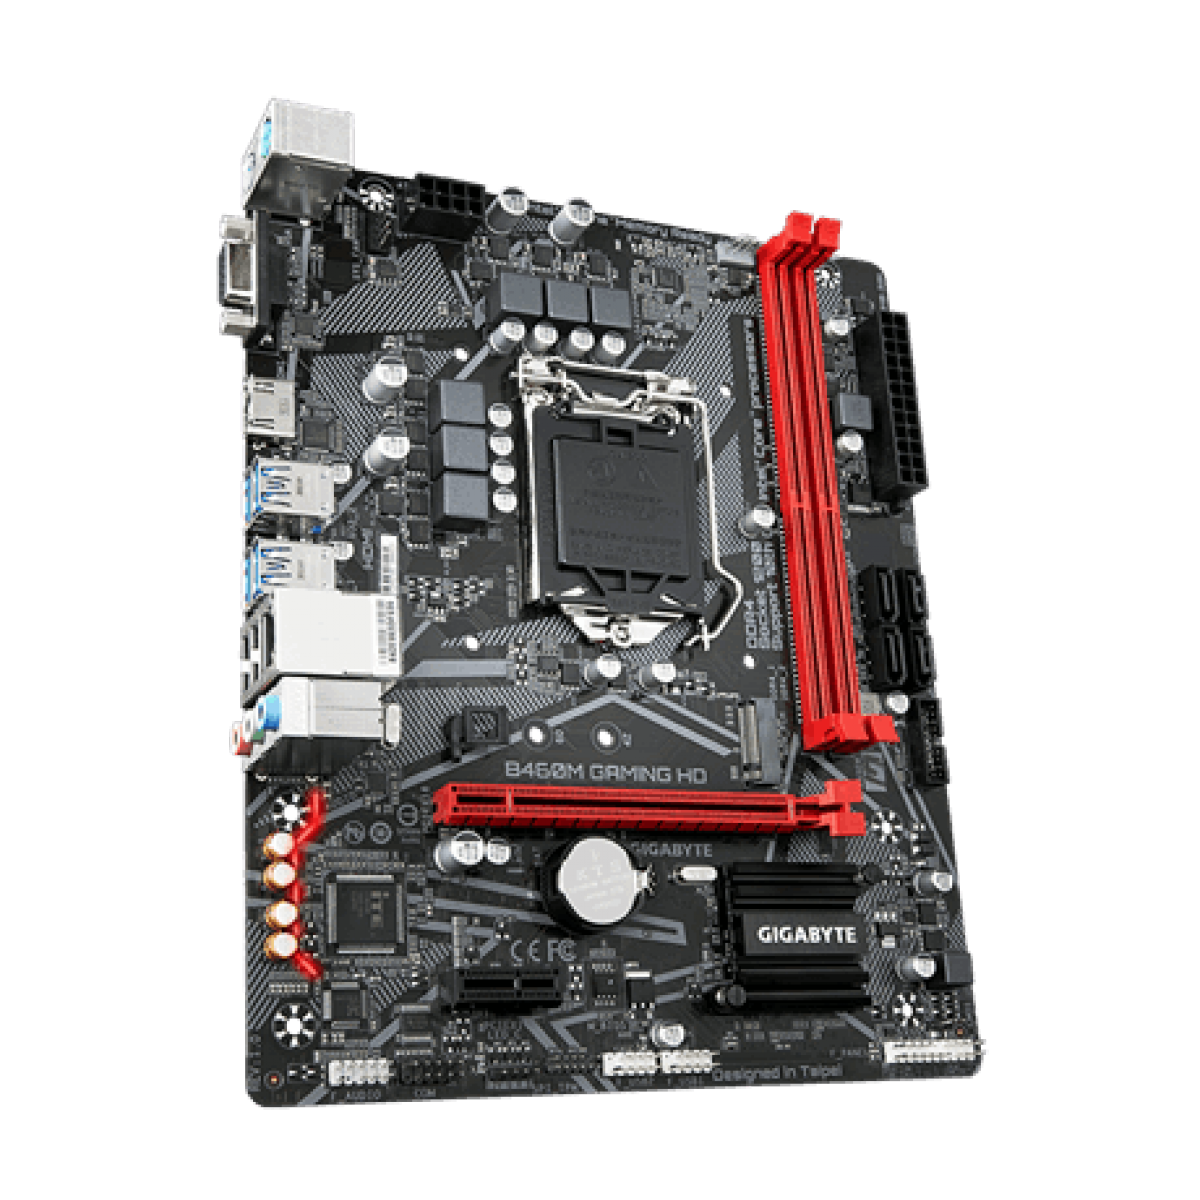 Placa Mãe Gigabyte B460M Gaming HD , Chipset B460, Intel LGA 1200, mATX, DDR4